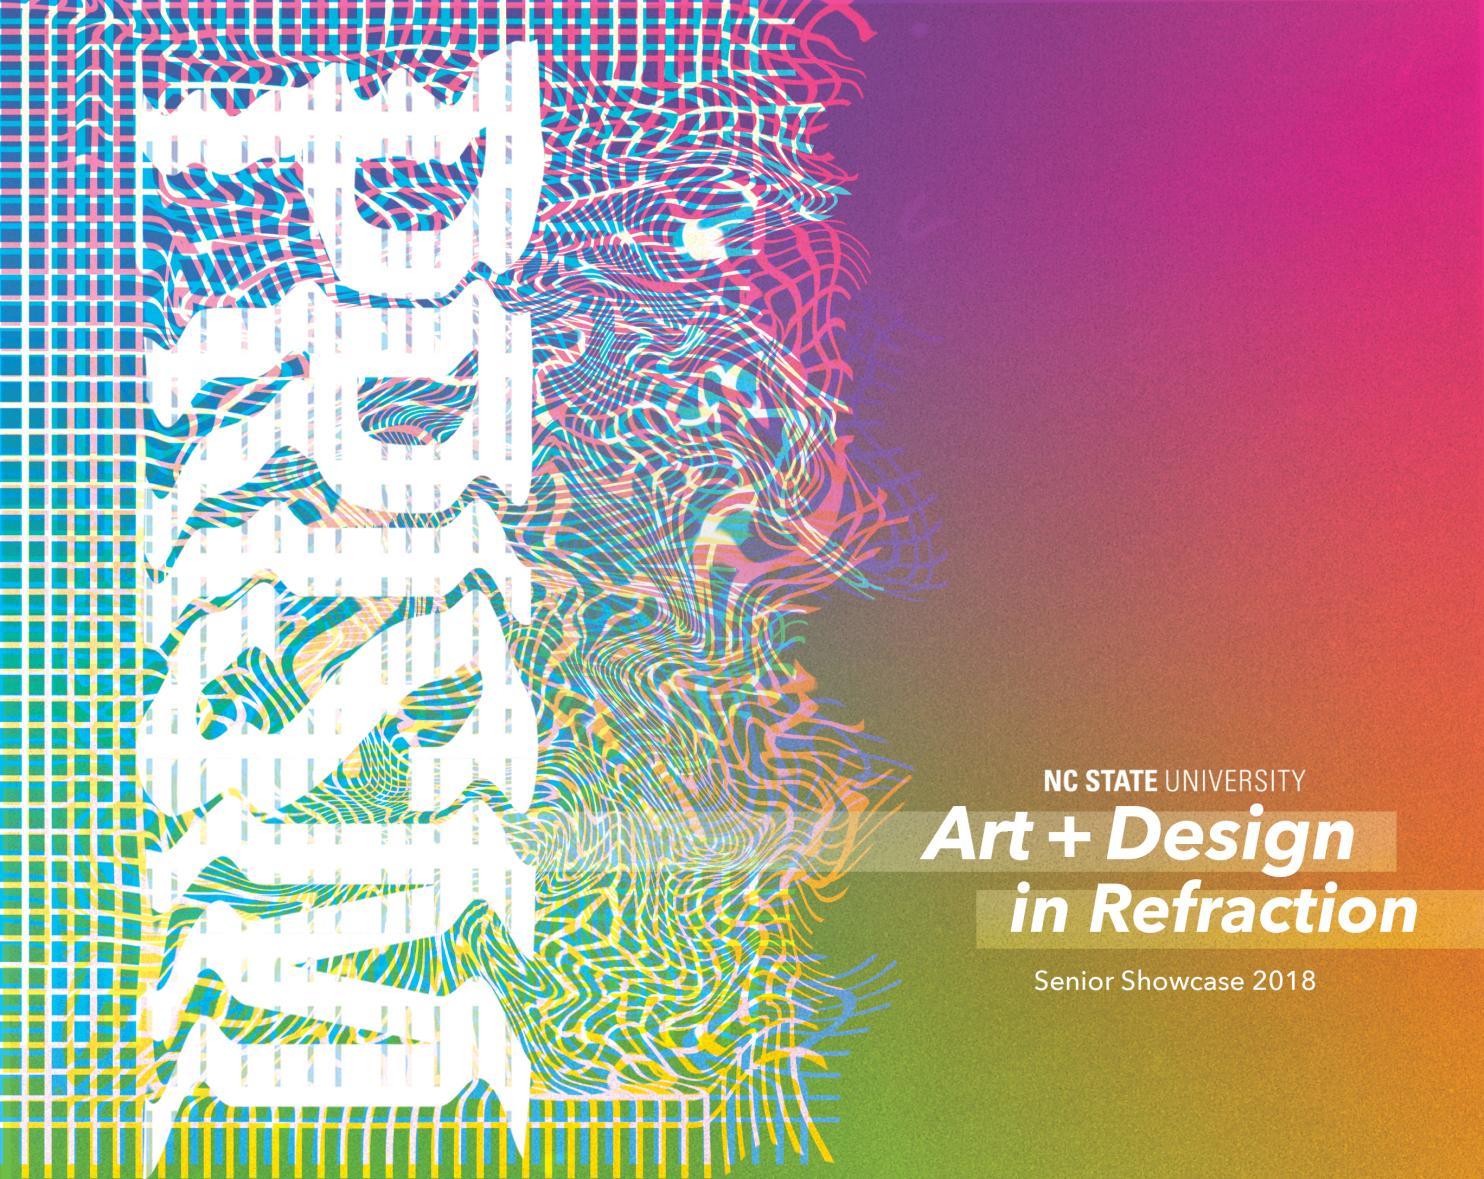 Nc State Design Prism Art Design Senior Showcase 2019 19 By Nc State College Of Design Issuu